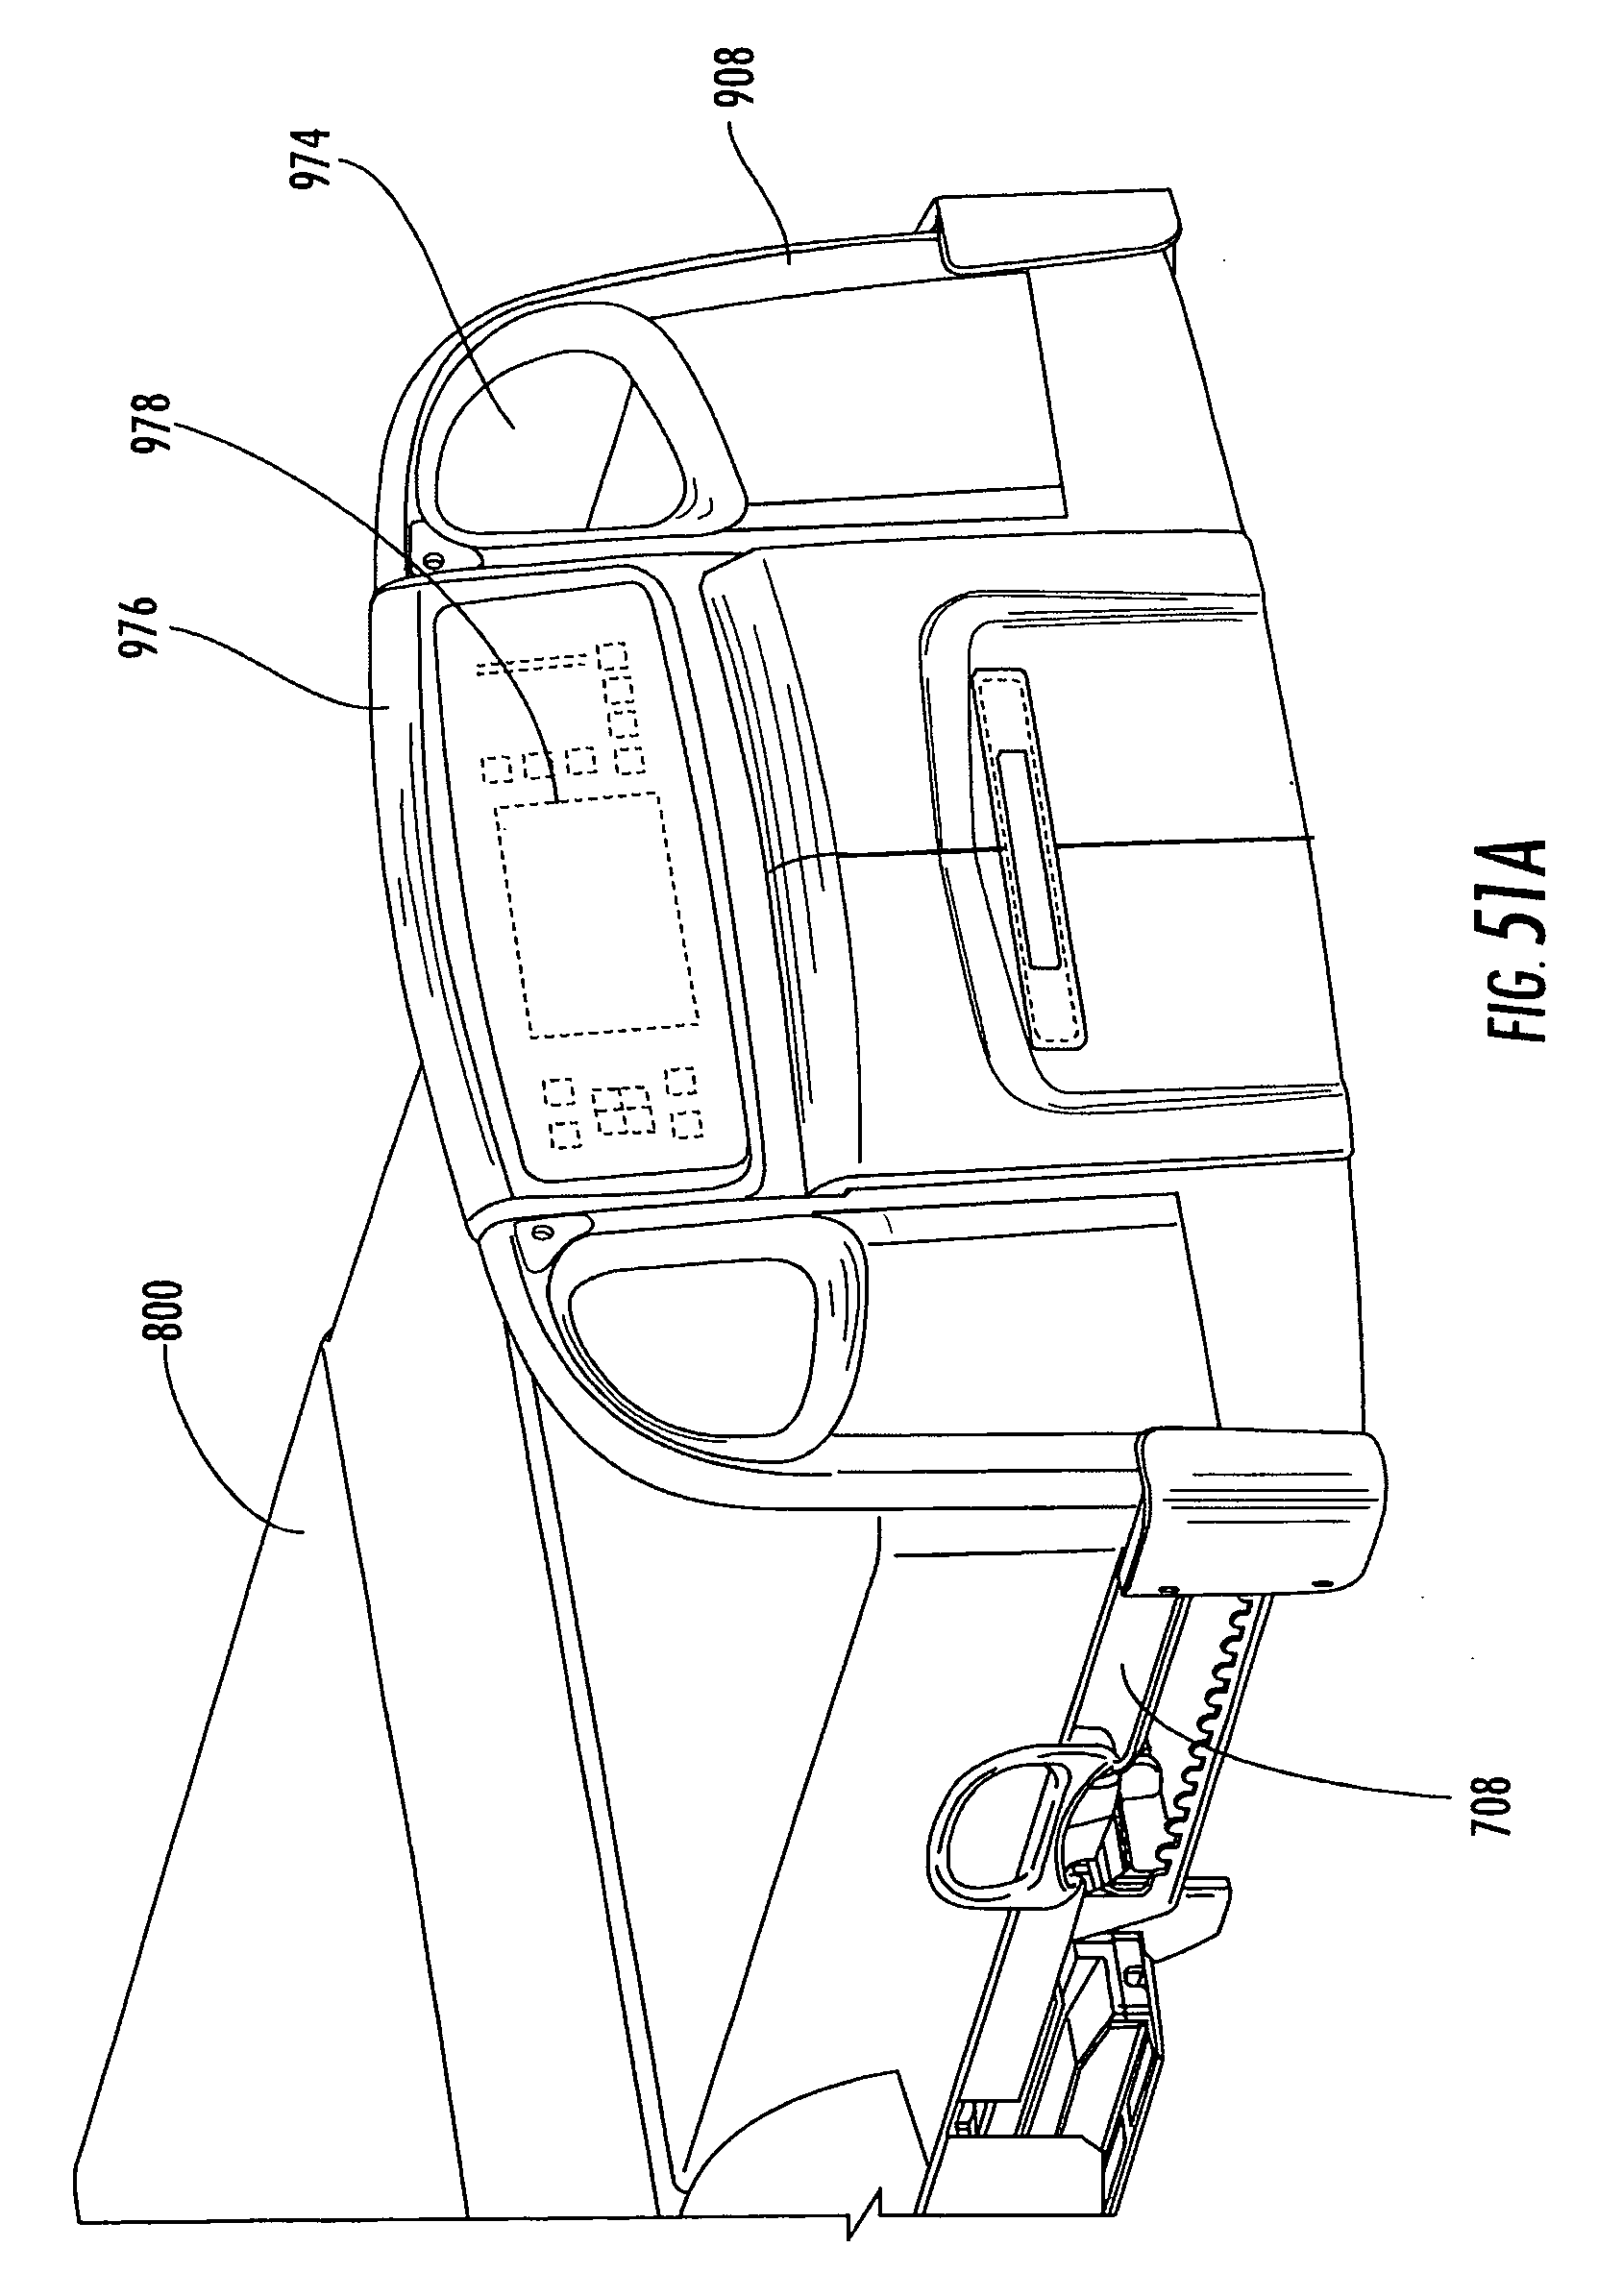 patent us 7 962 981 b2 Electronic Technician Art patent images